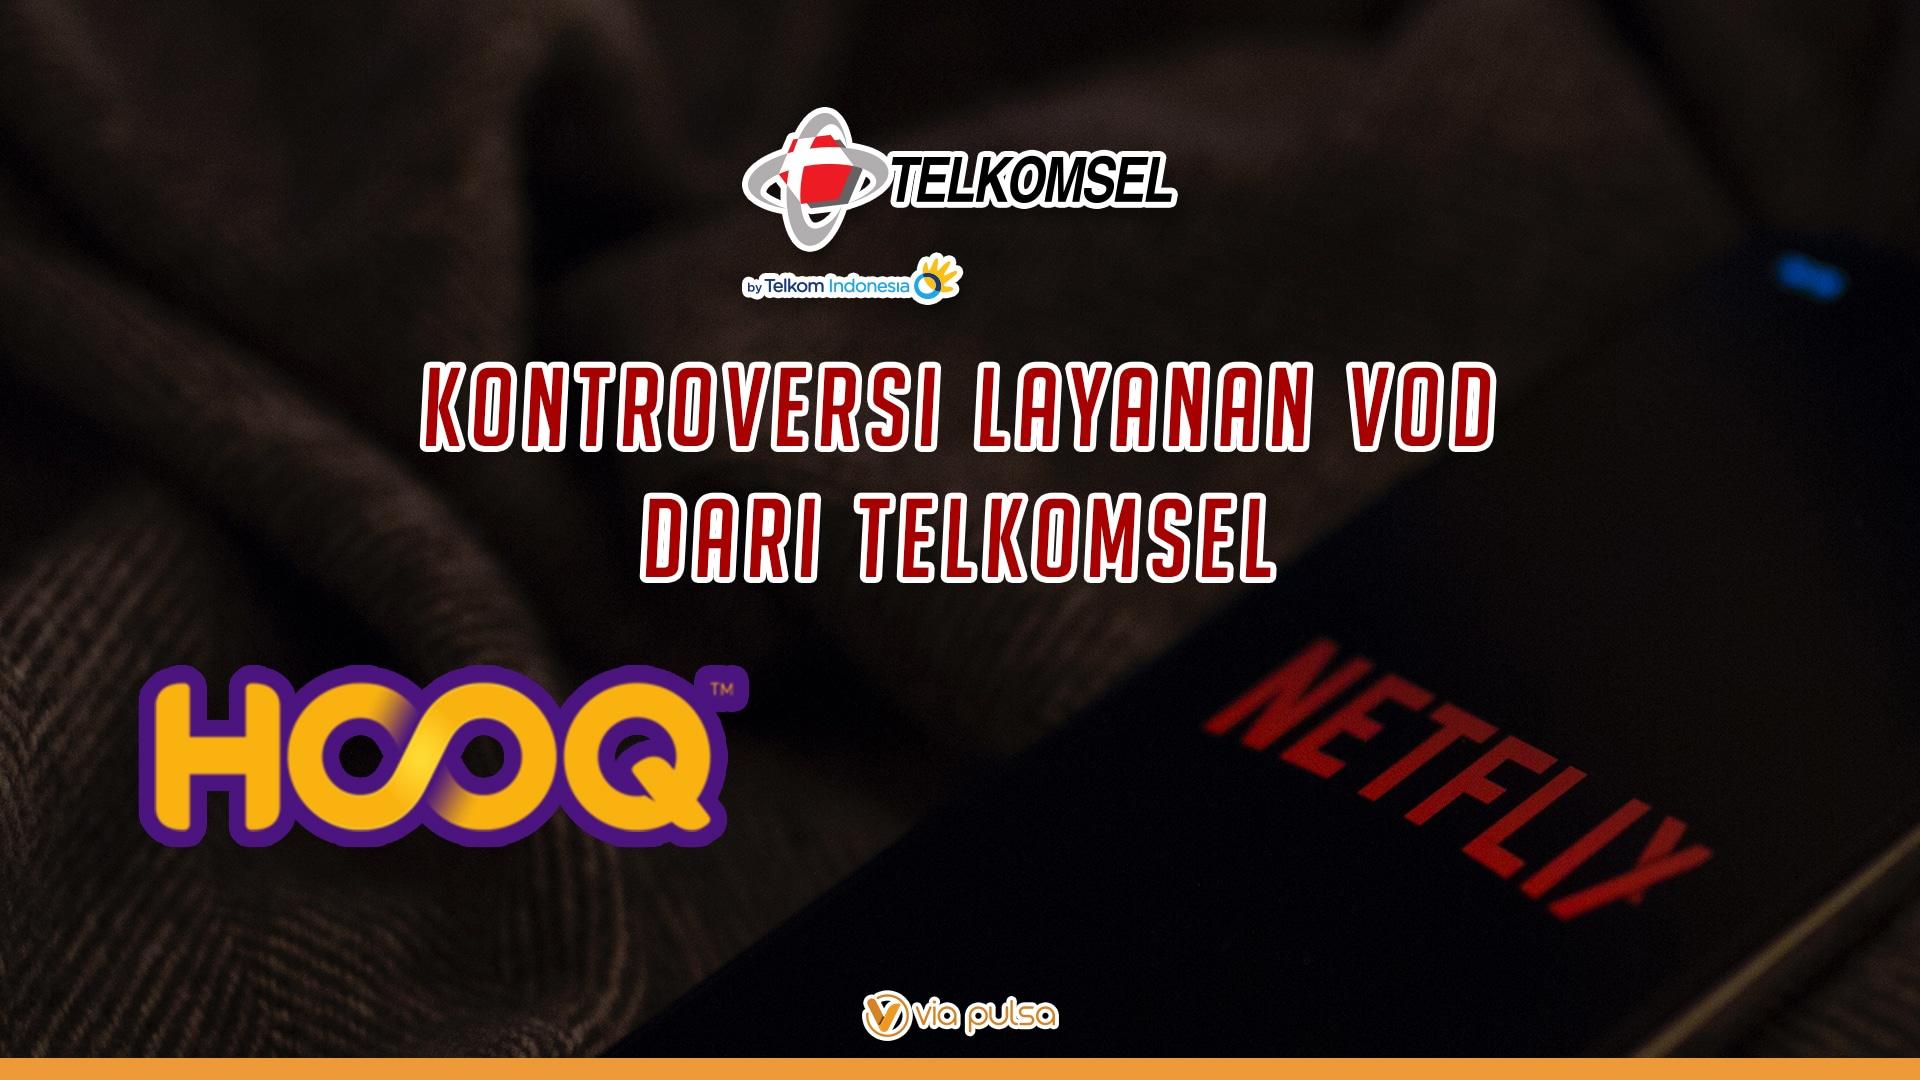 Background Artikel Kontroversi Layanan VOD Dari Telkomsel